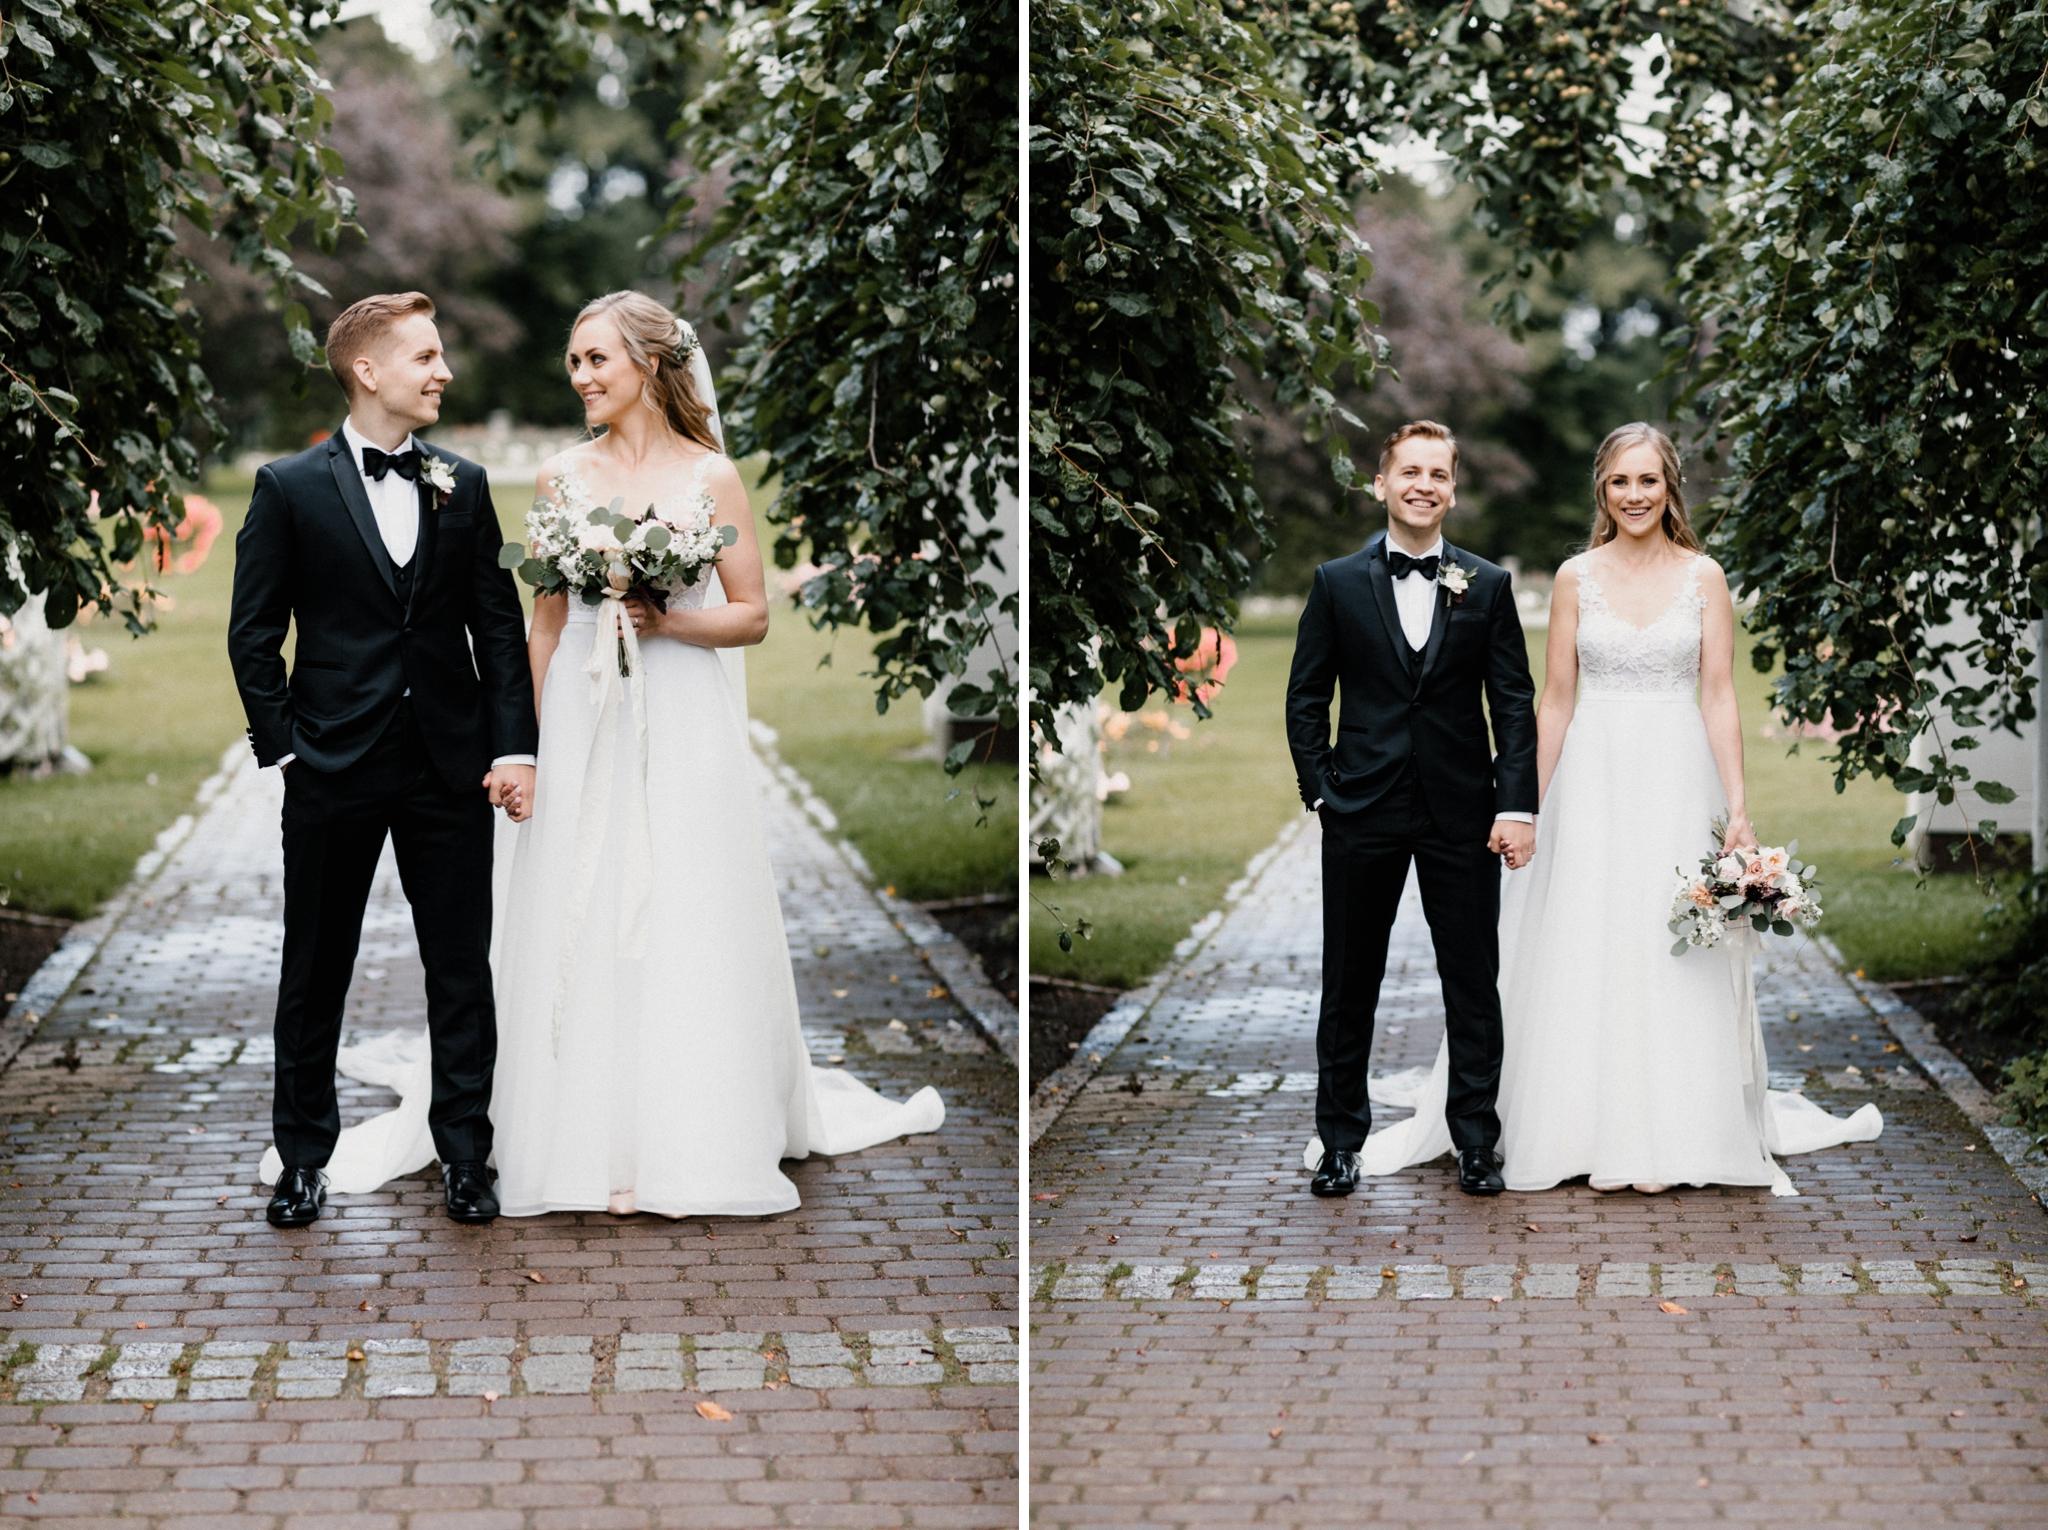 Johanna + Mikko - Tampere - Photo by Patrick Karkkolainen Wedding Photographer-24.jpg